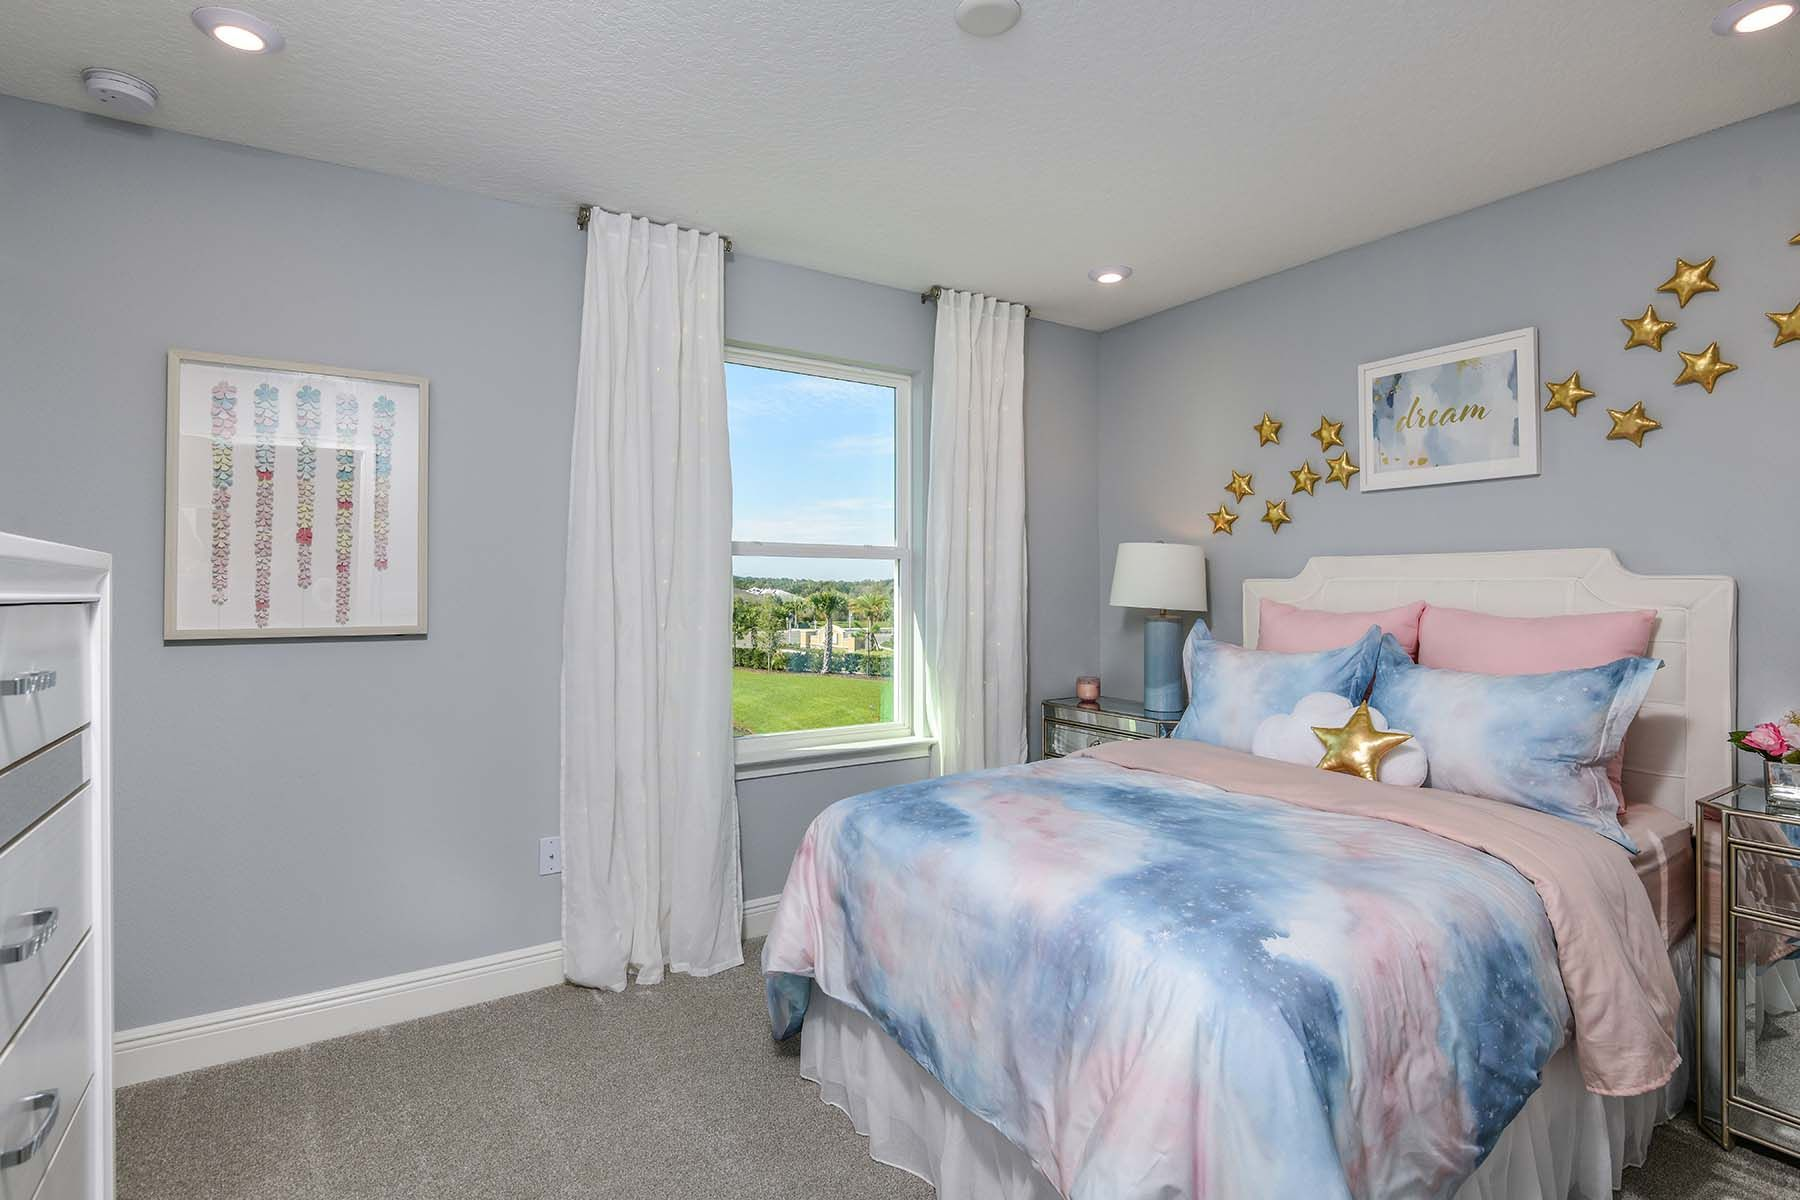 Bedroom featured in the Seaside II End By Mattamy Homes in Sarasota-Bradenton, FL